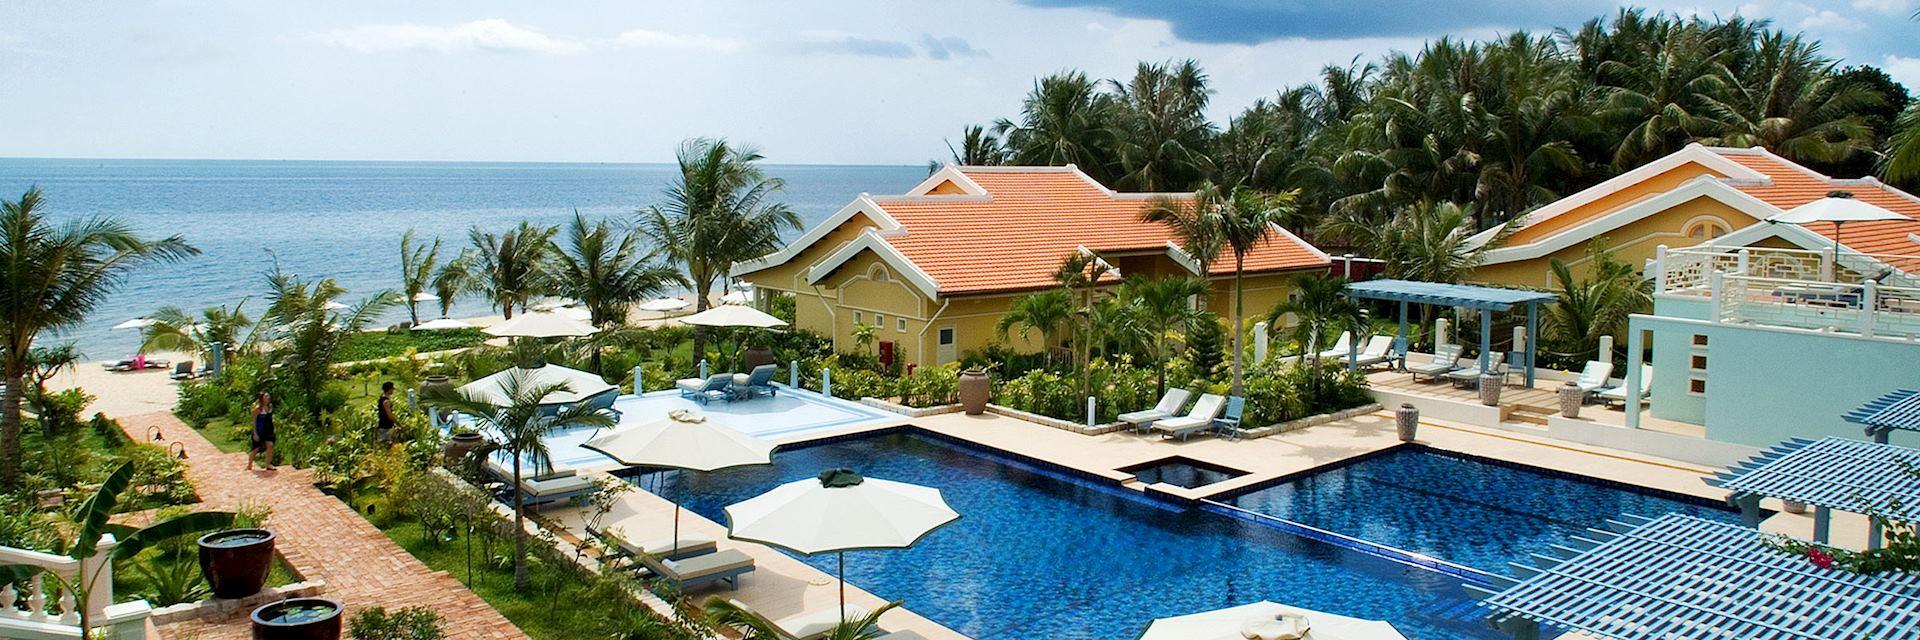 La Veranda Resort, Phu Quoc